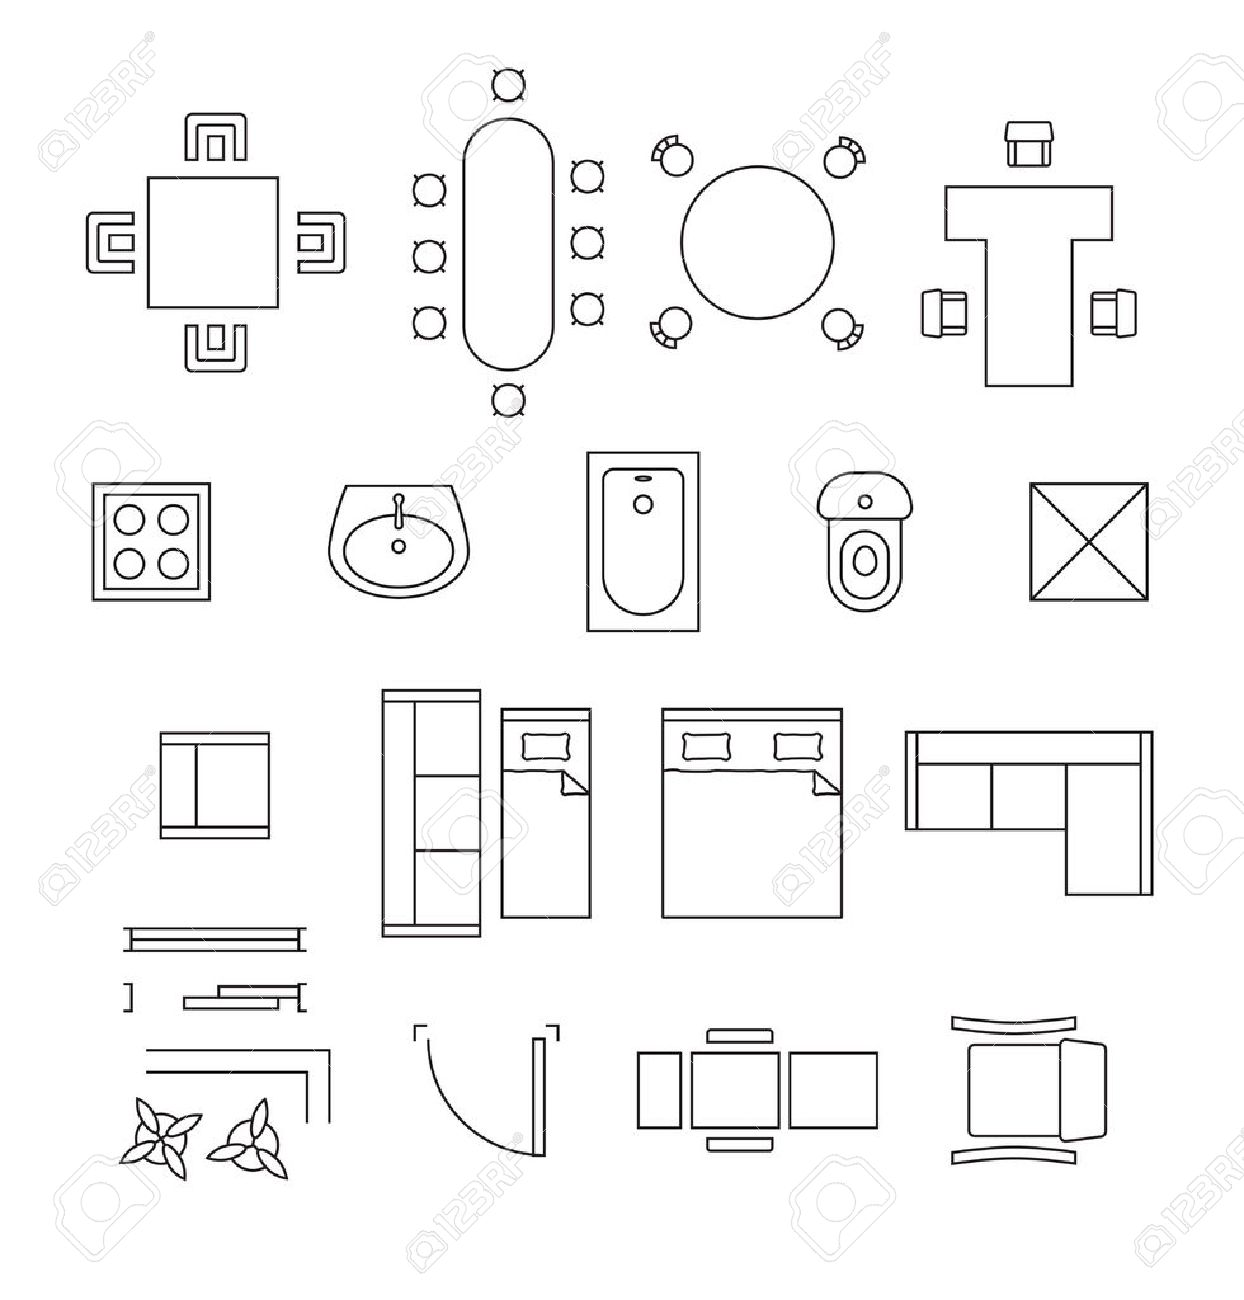 floor plan furniture symbols. Furniture Linear Symbols. Floor Plan Icons Set. Interior And Toilet,  Washbasin Bath Floor Furniture Symbols B